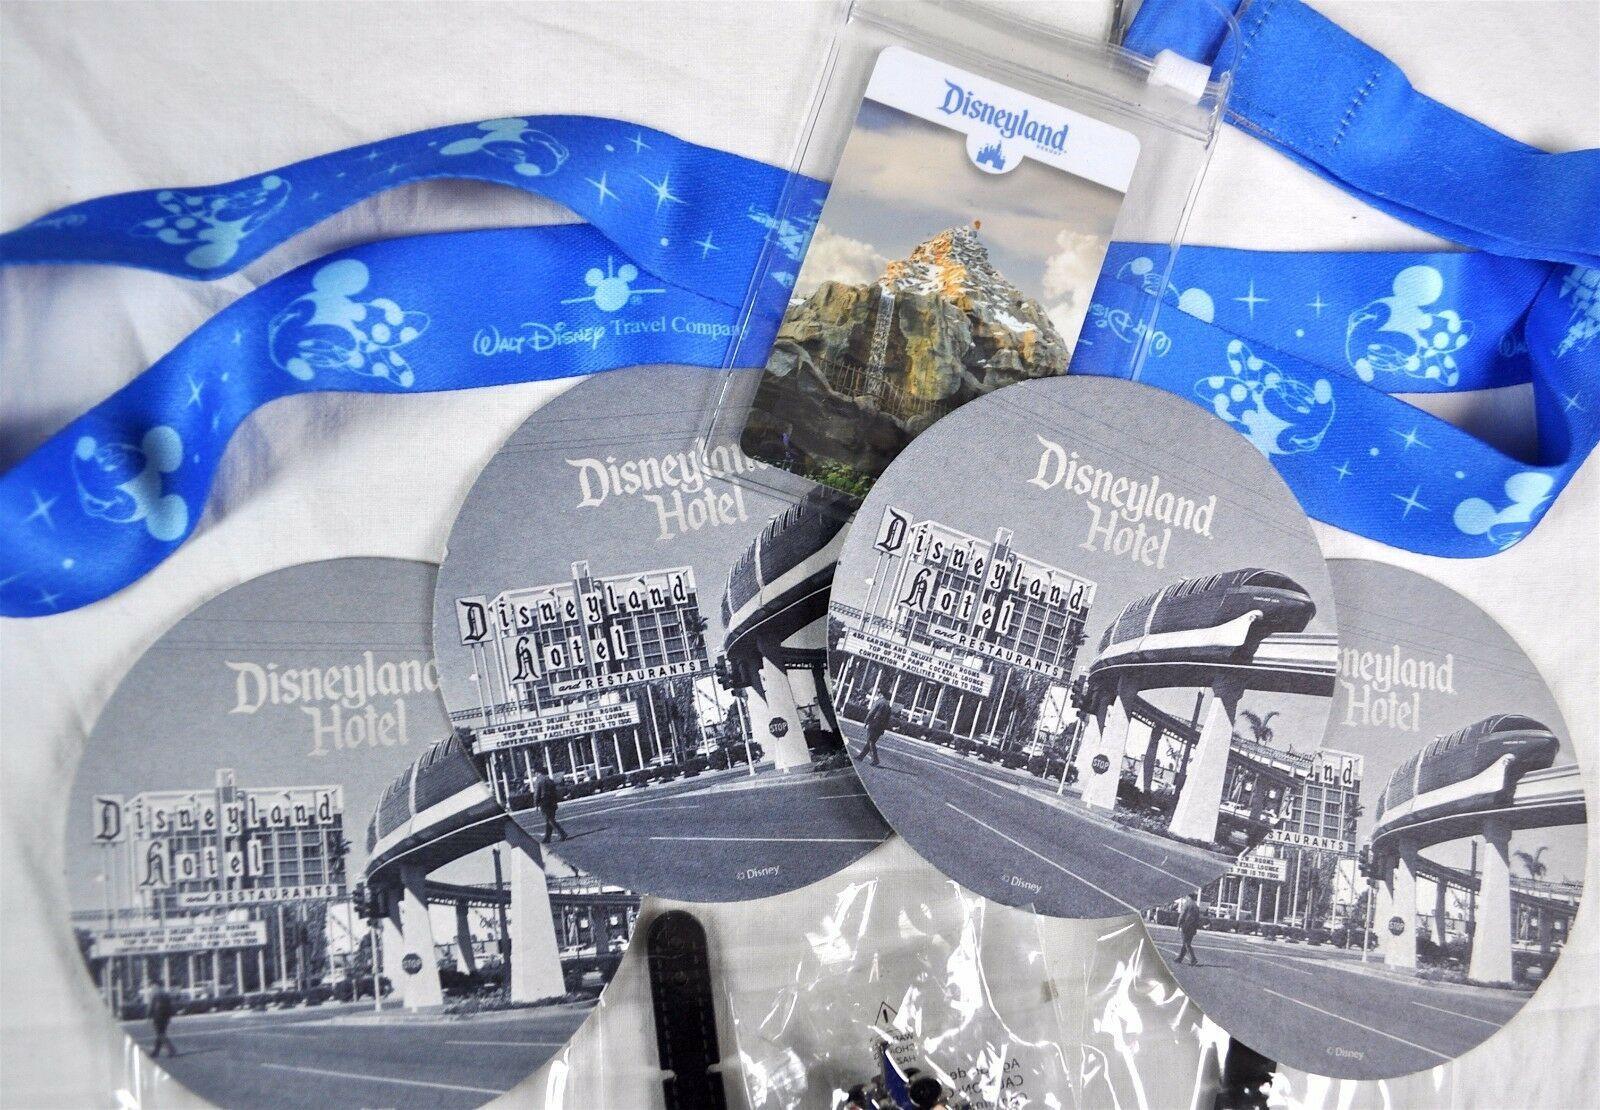 Disneyland Travel Mickey Minnie Lanyard Pin Luggage ID Tags Coasters 9 Item Lot